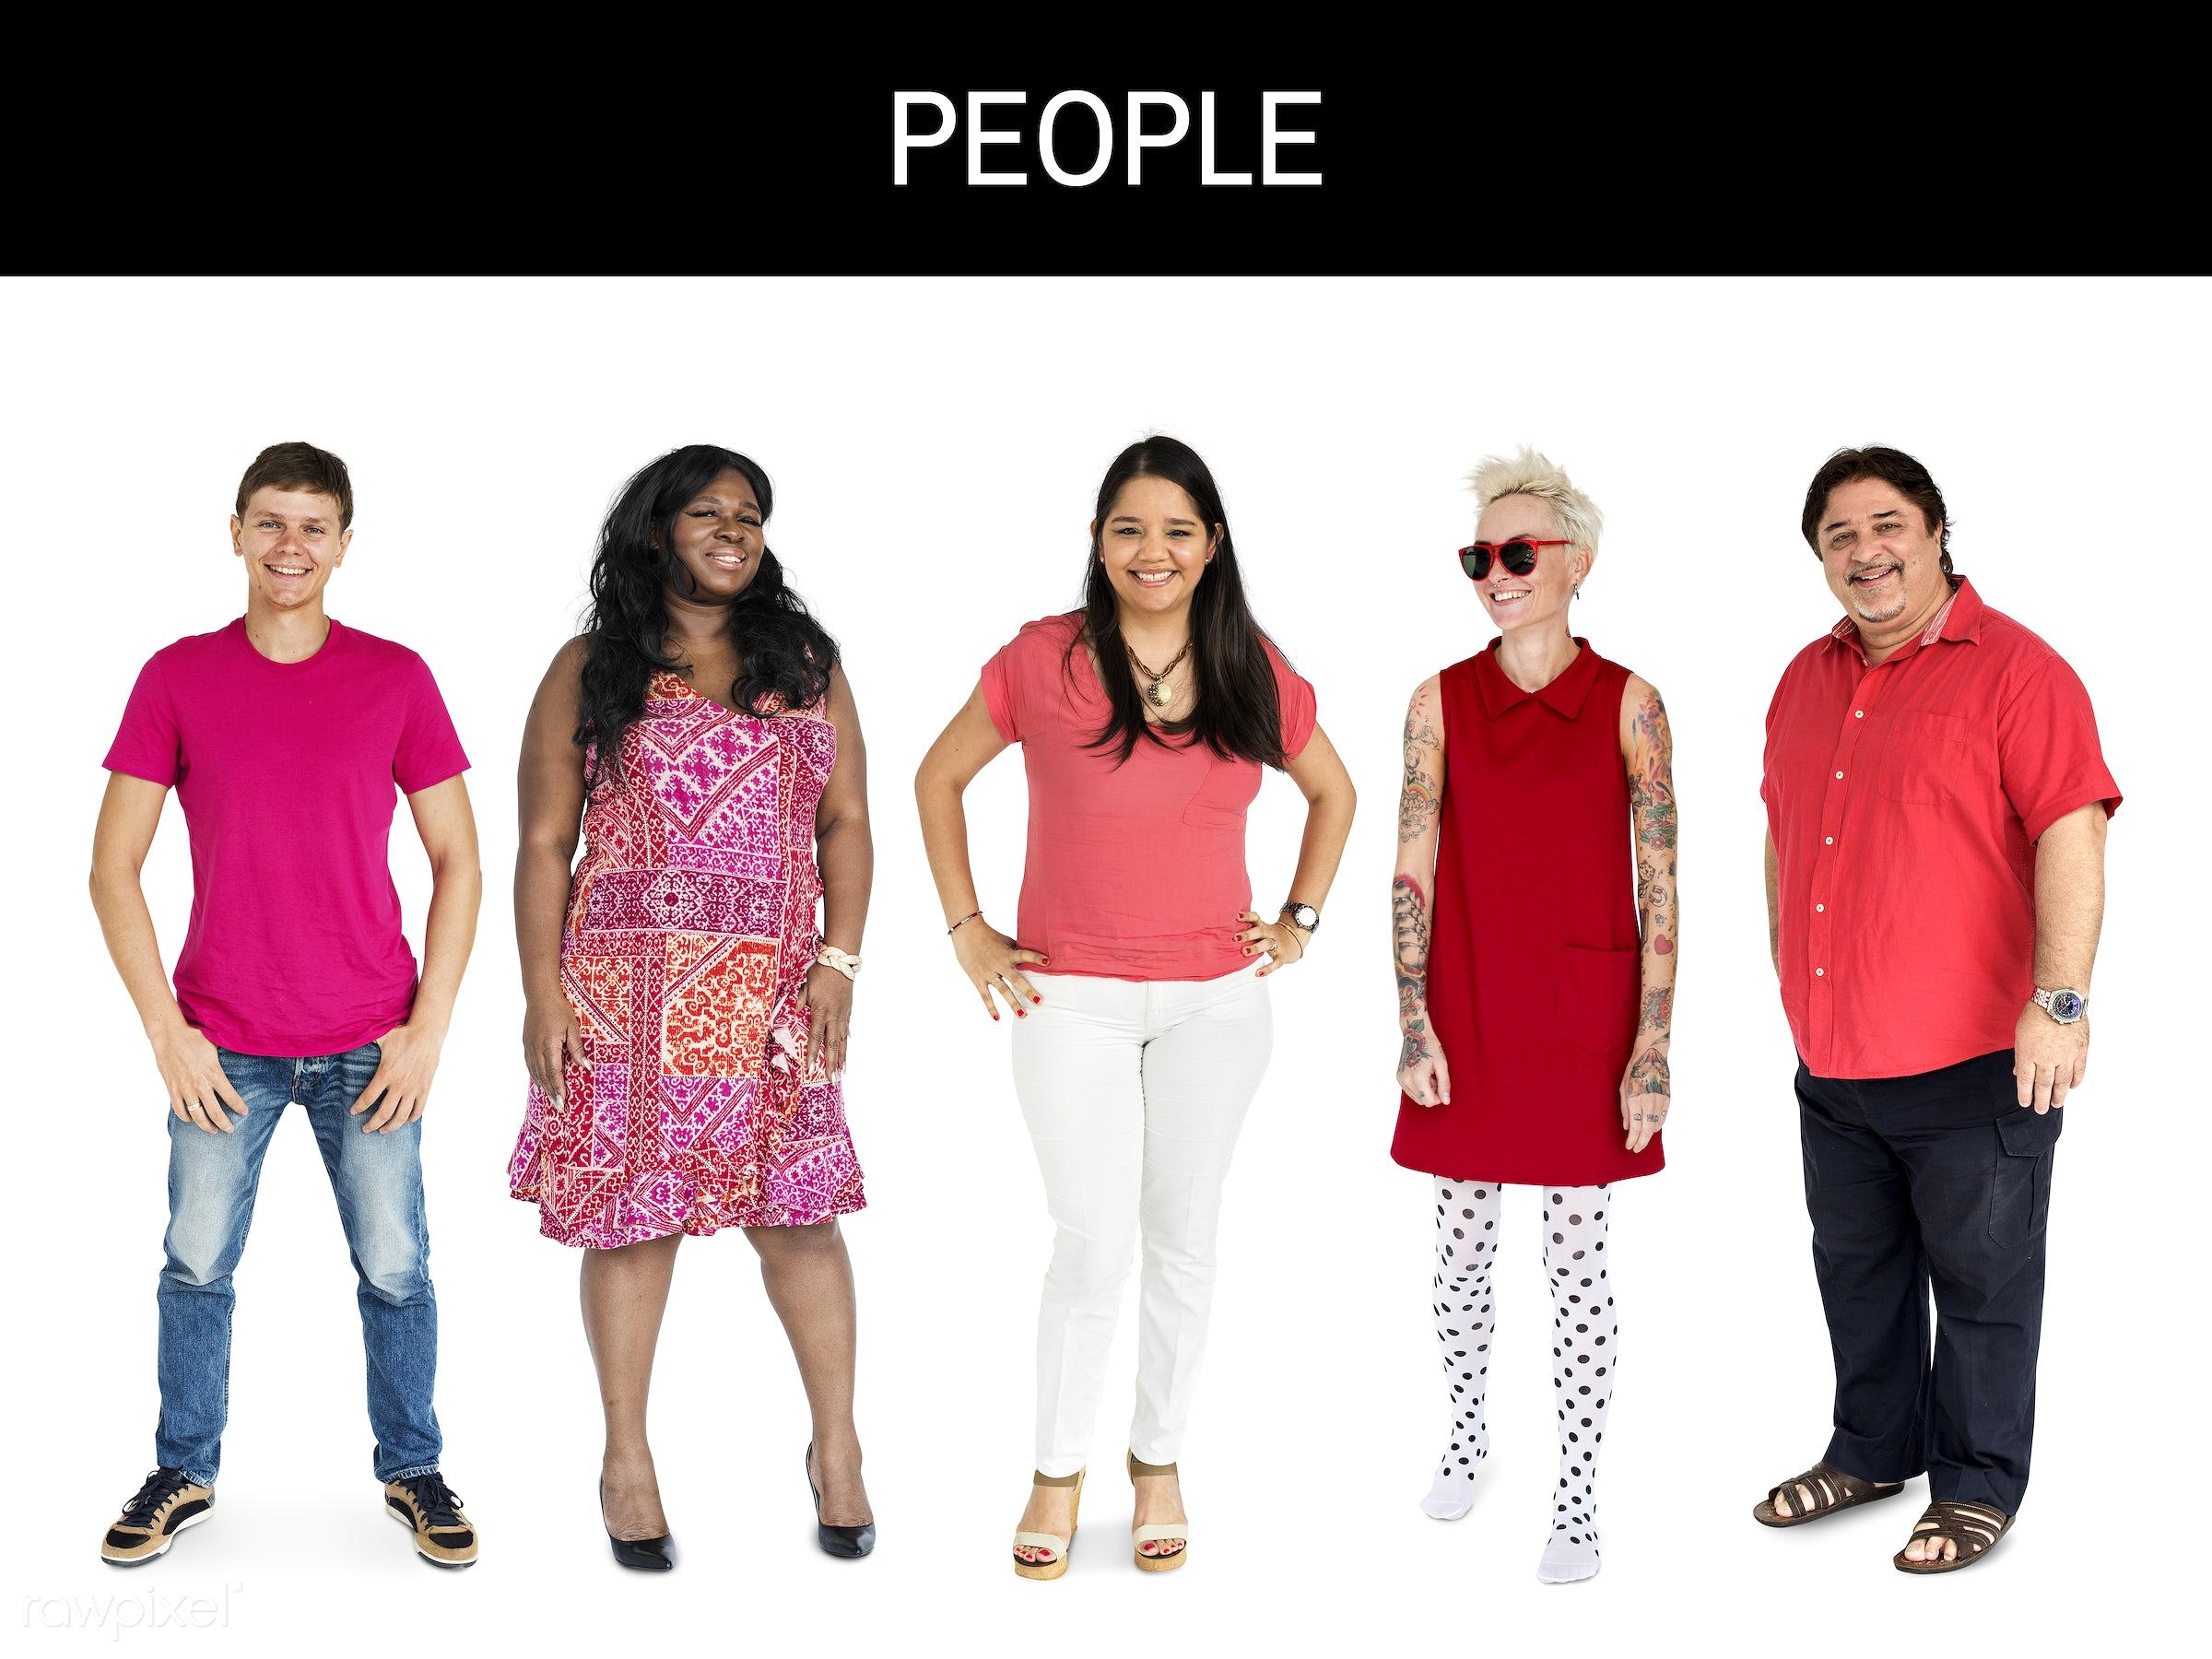 gentlemen, studio, person, diverse, tee, people, attraction, together, caucasian, asian, woman, lifestyle, studio squareset...